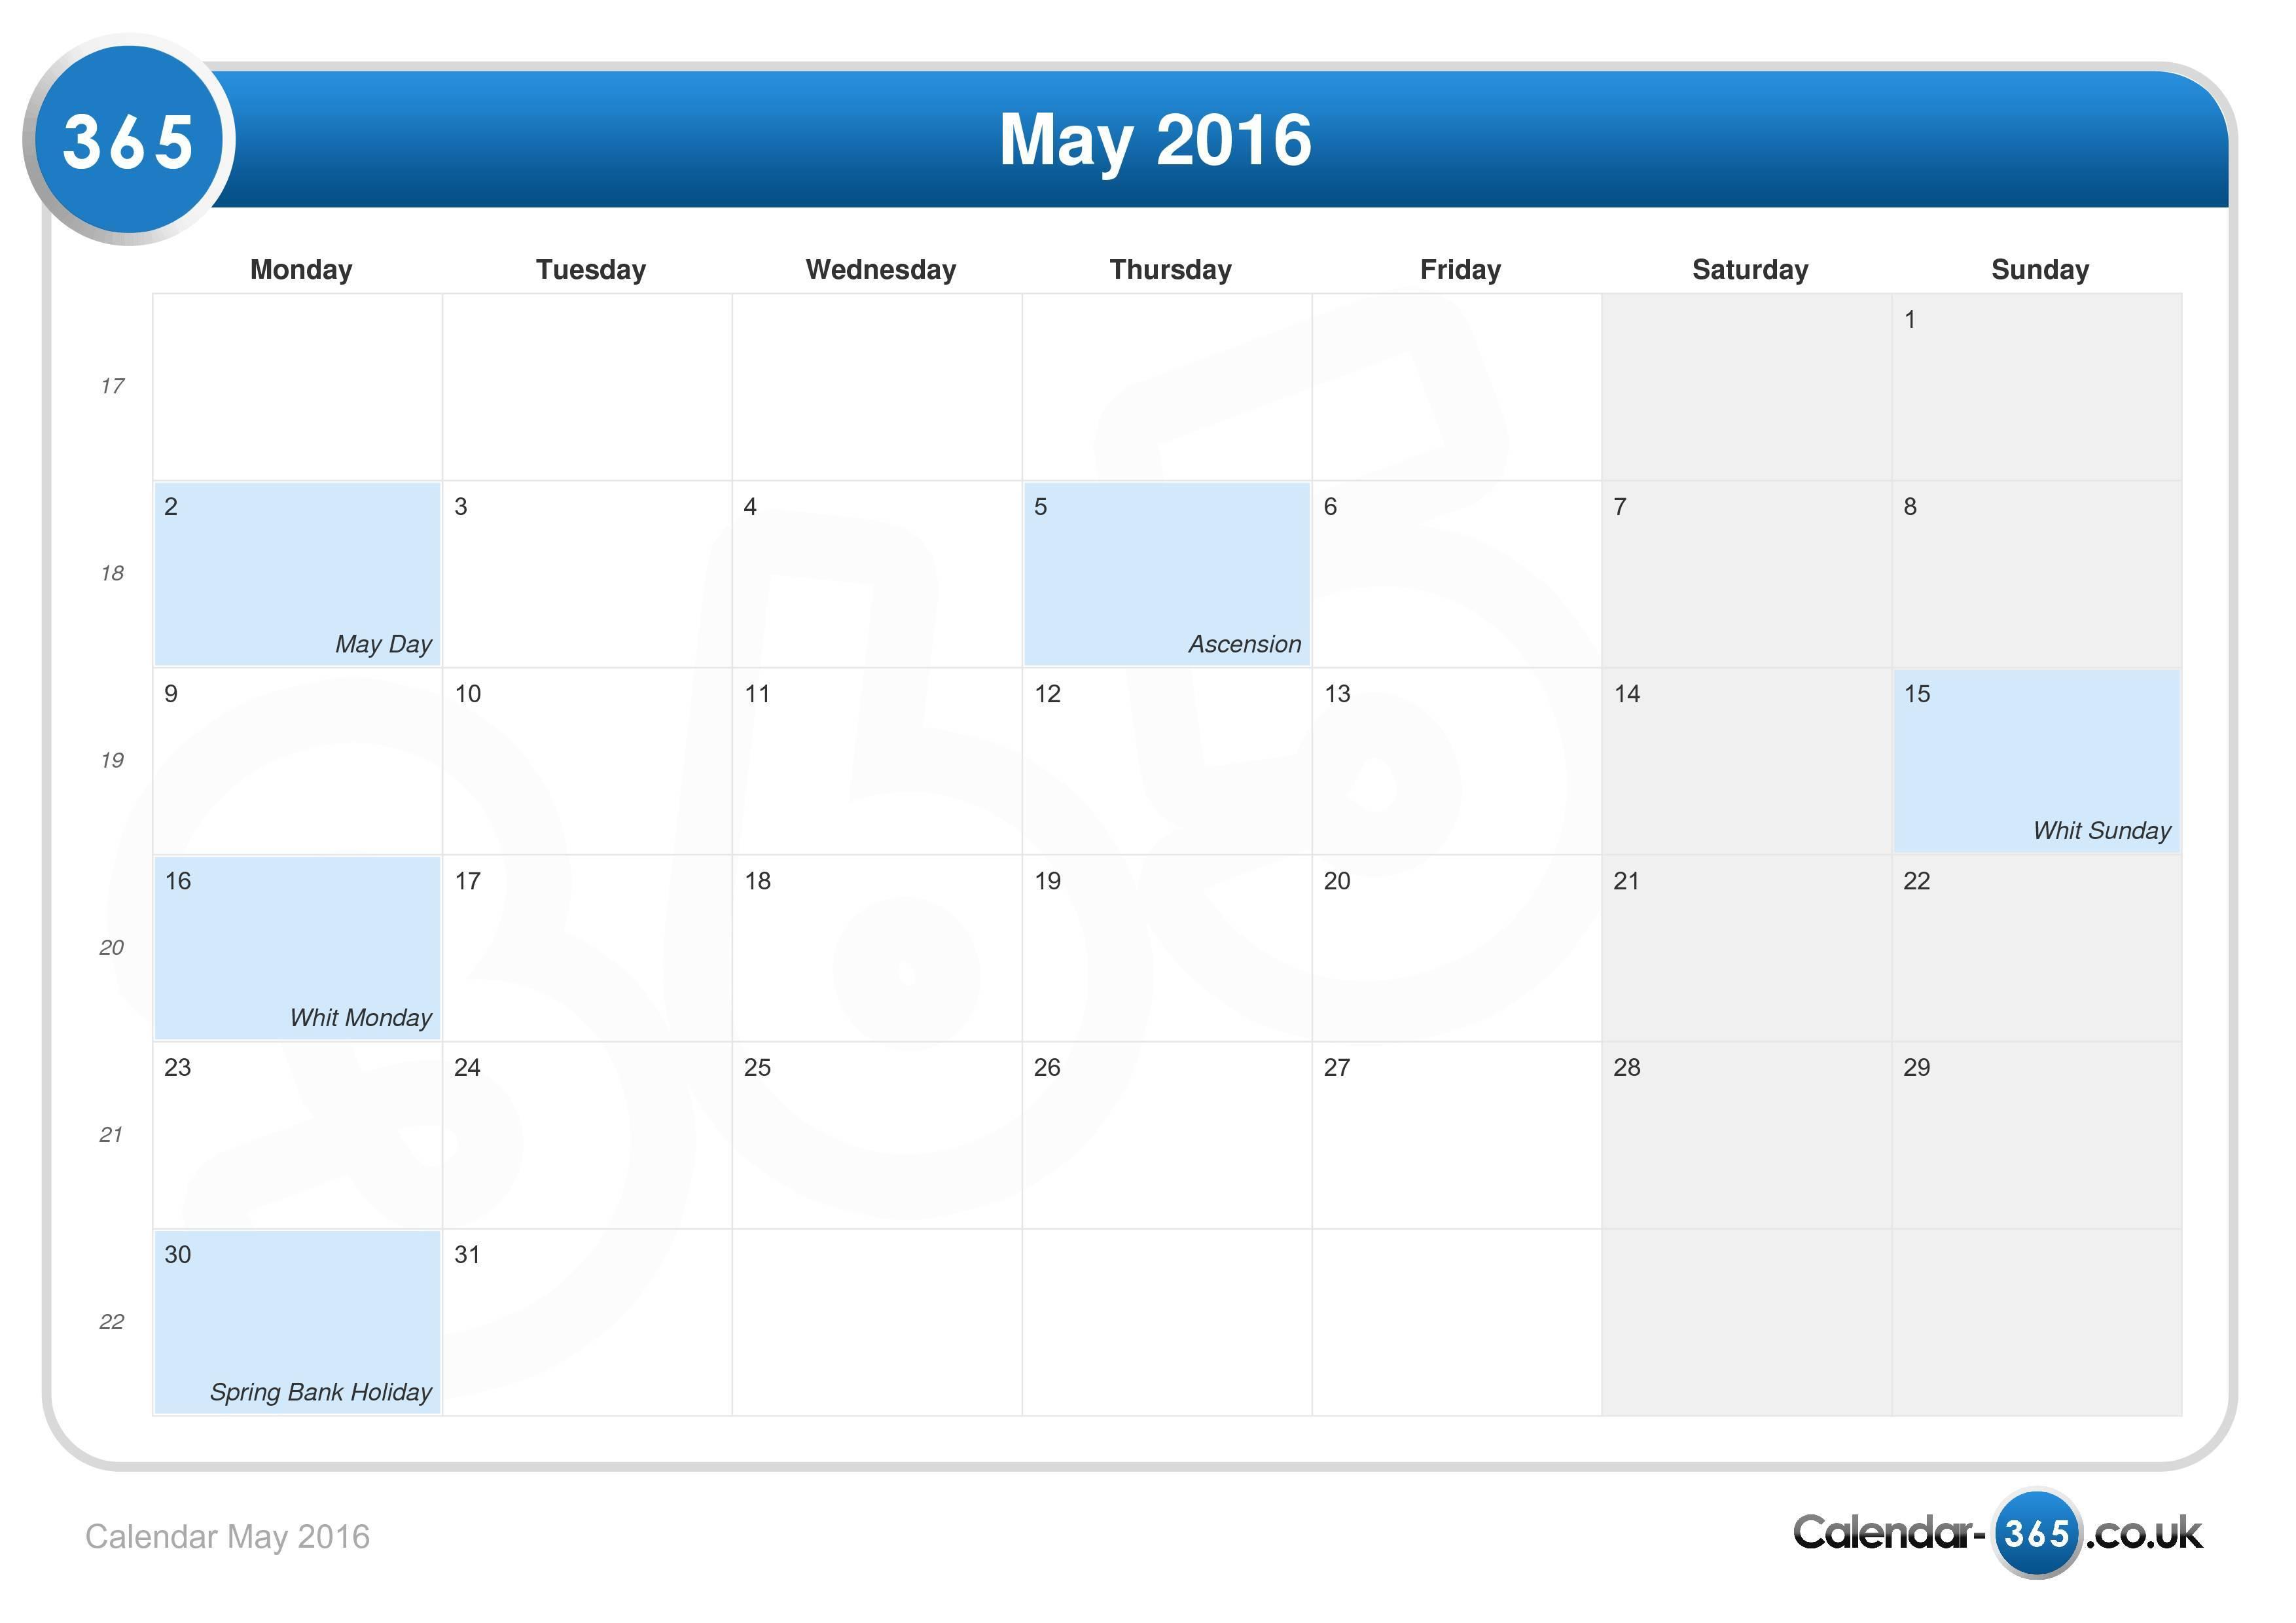 Calendar May Uk : Bank holidays uk calendar « neo gifts